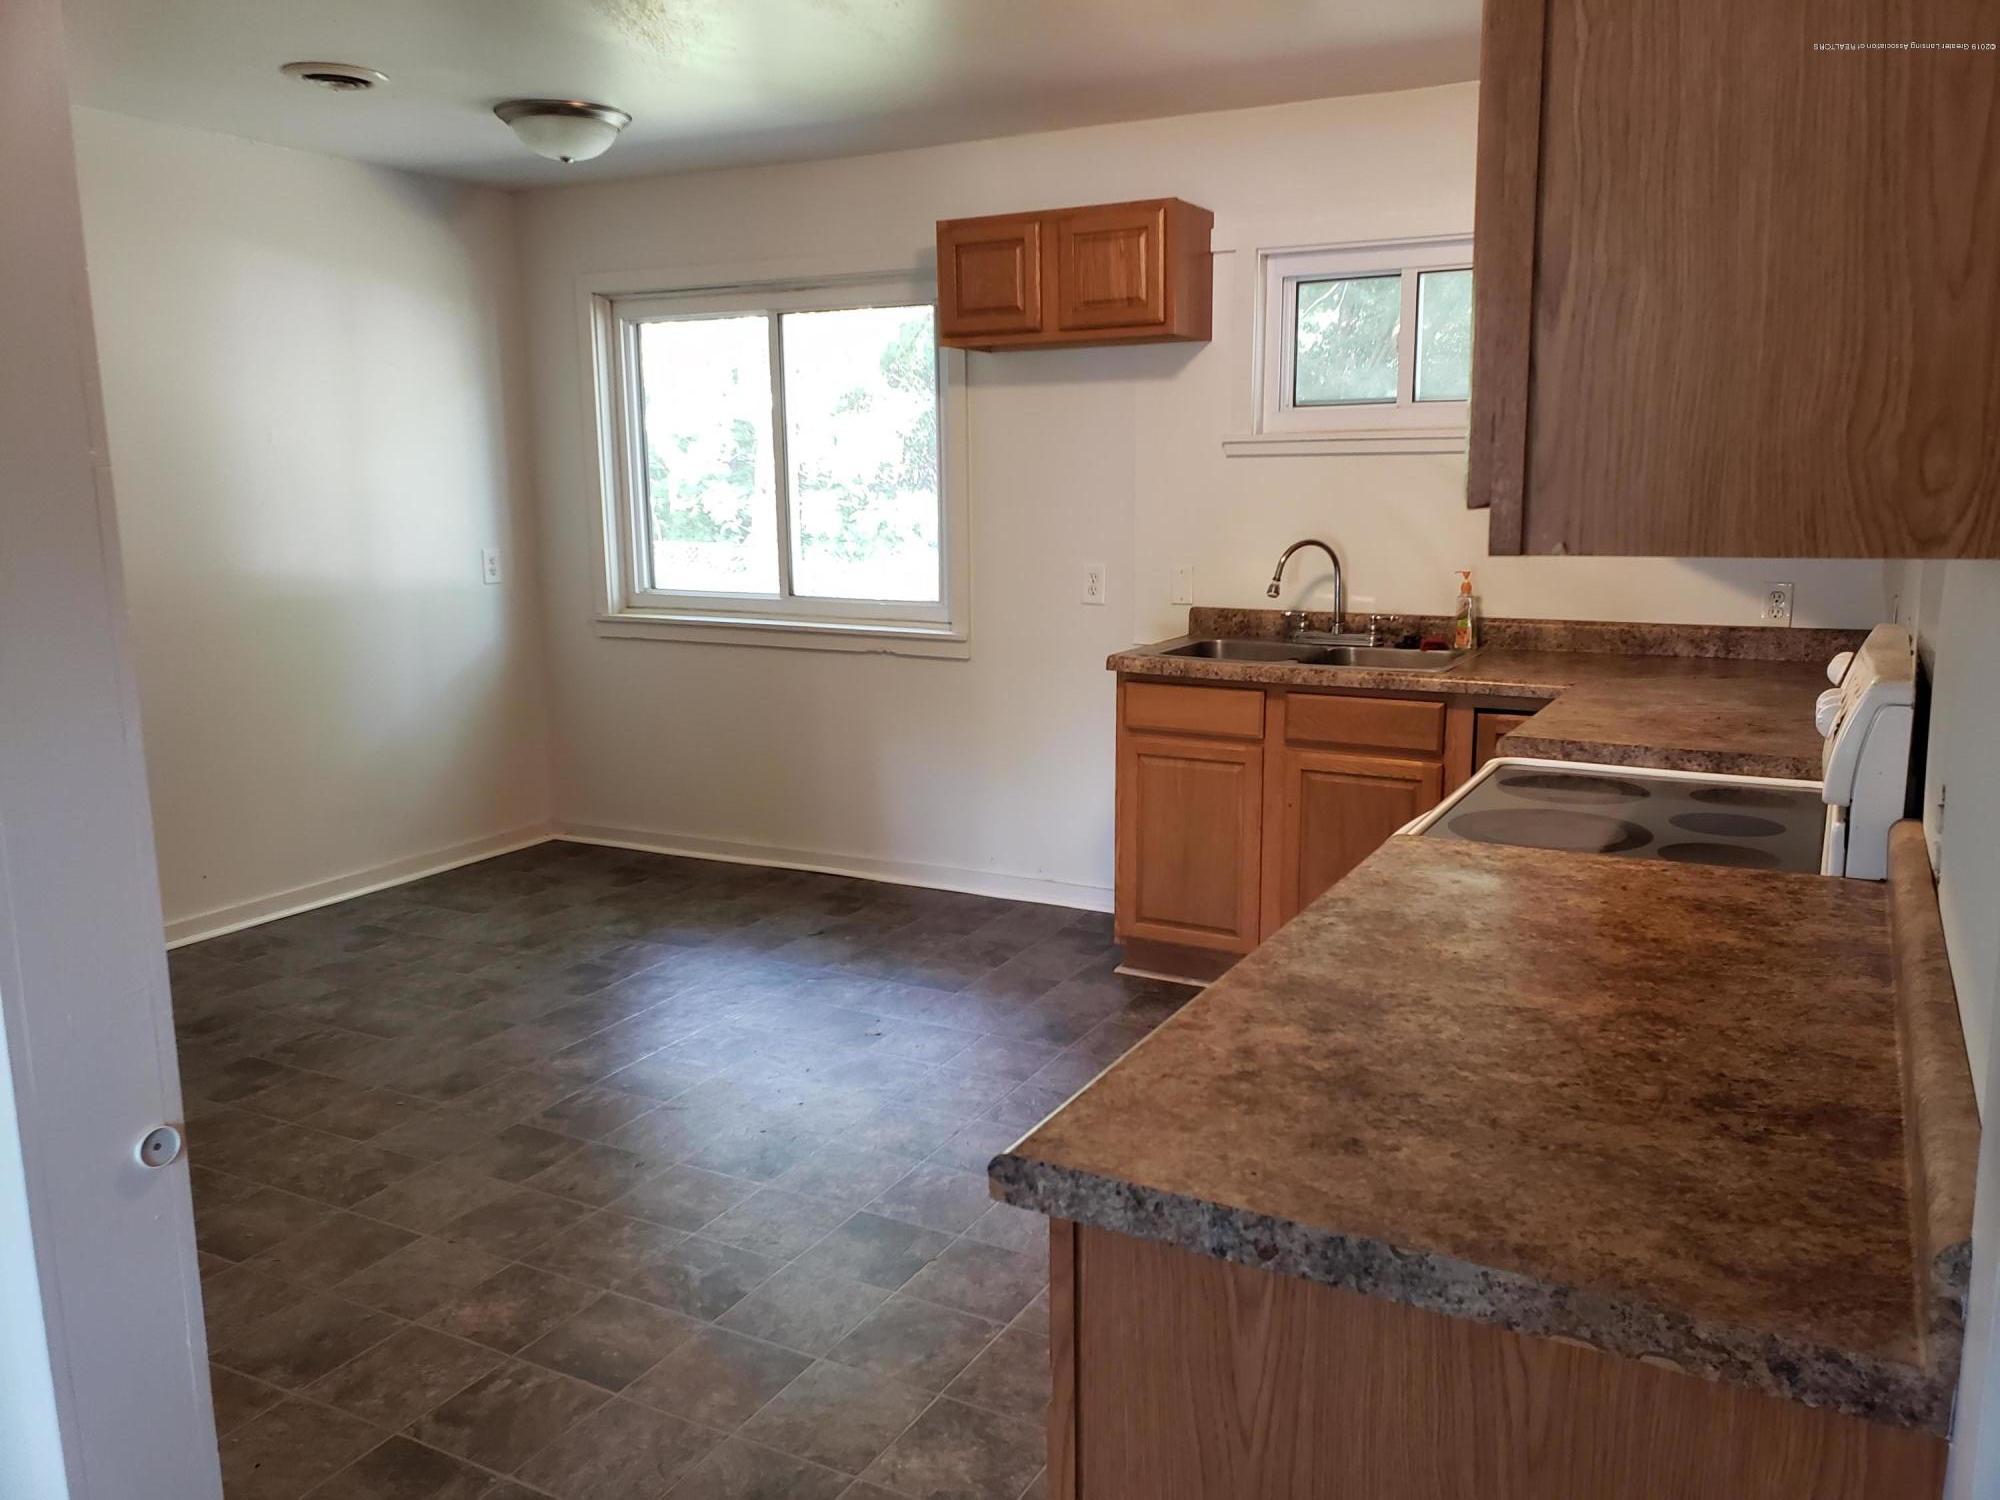 6037 Hughes Rd - Hughes Kitchen 2 - 3